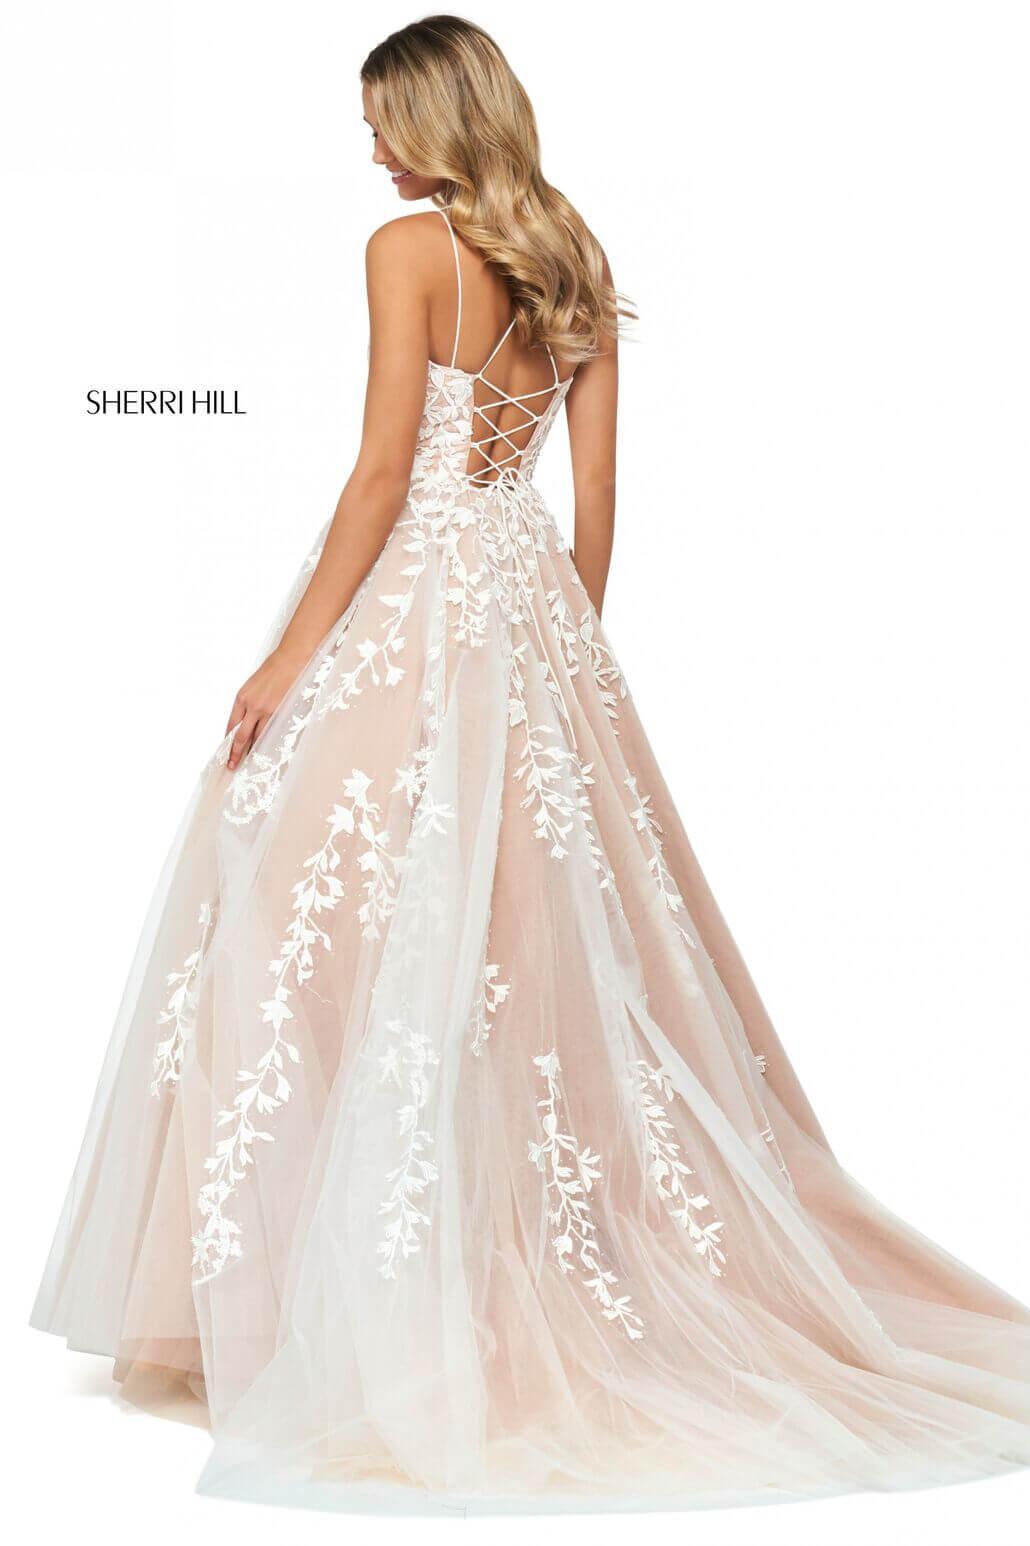 53116 Sherri Hill In Store Now Gossip Gowns,Fall Black Tie Wedding Guest Dresses